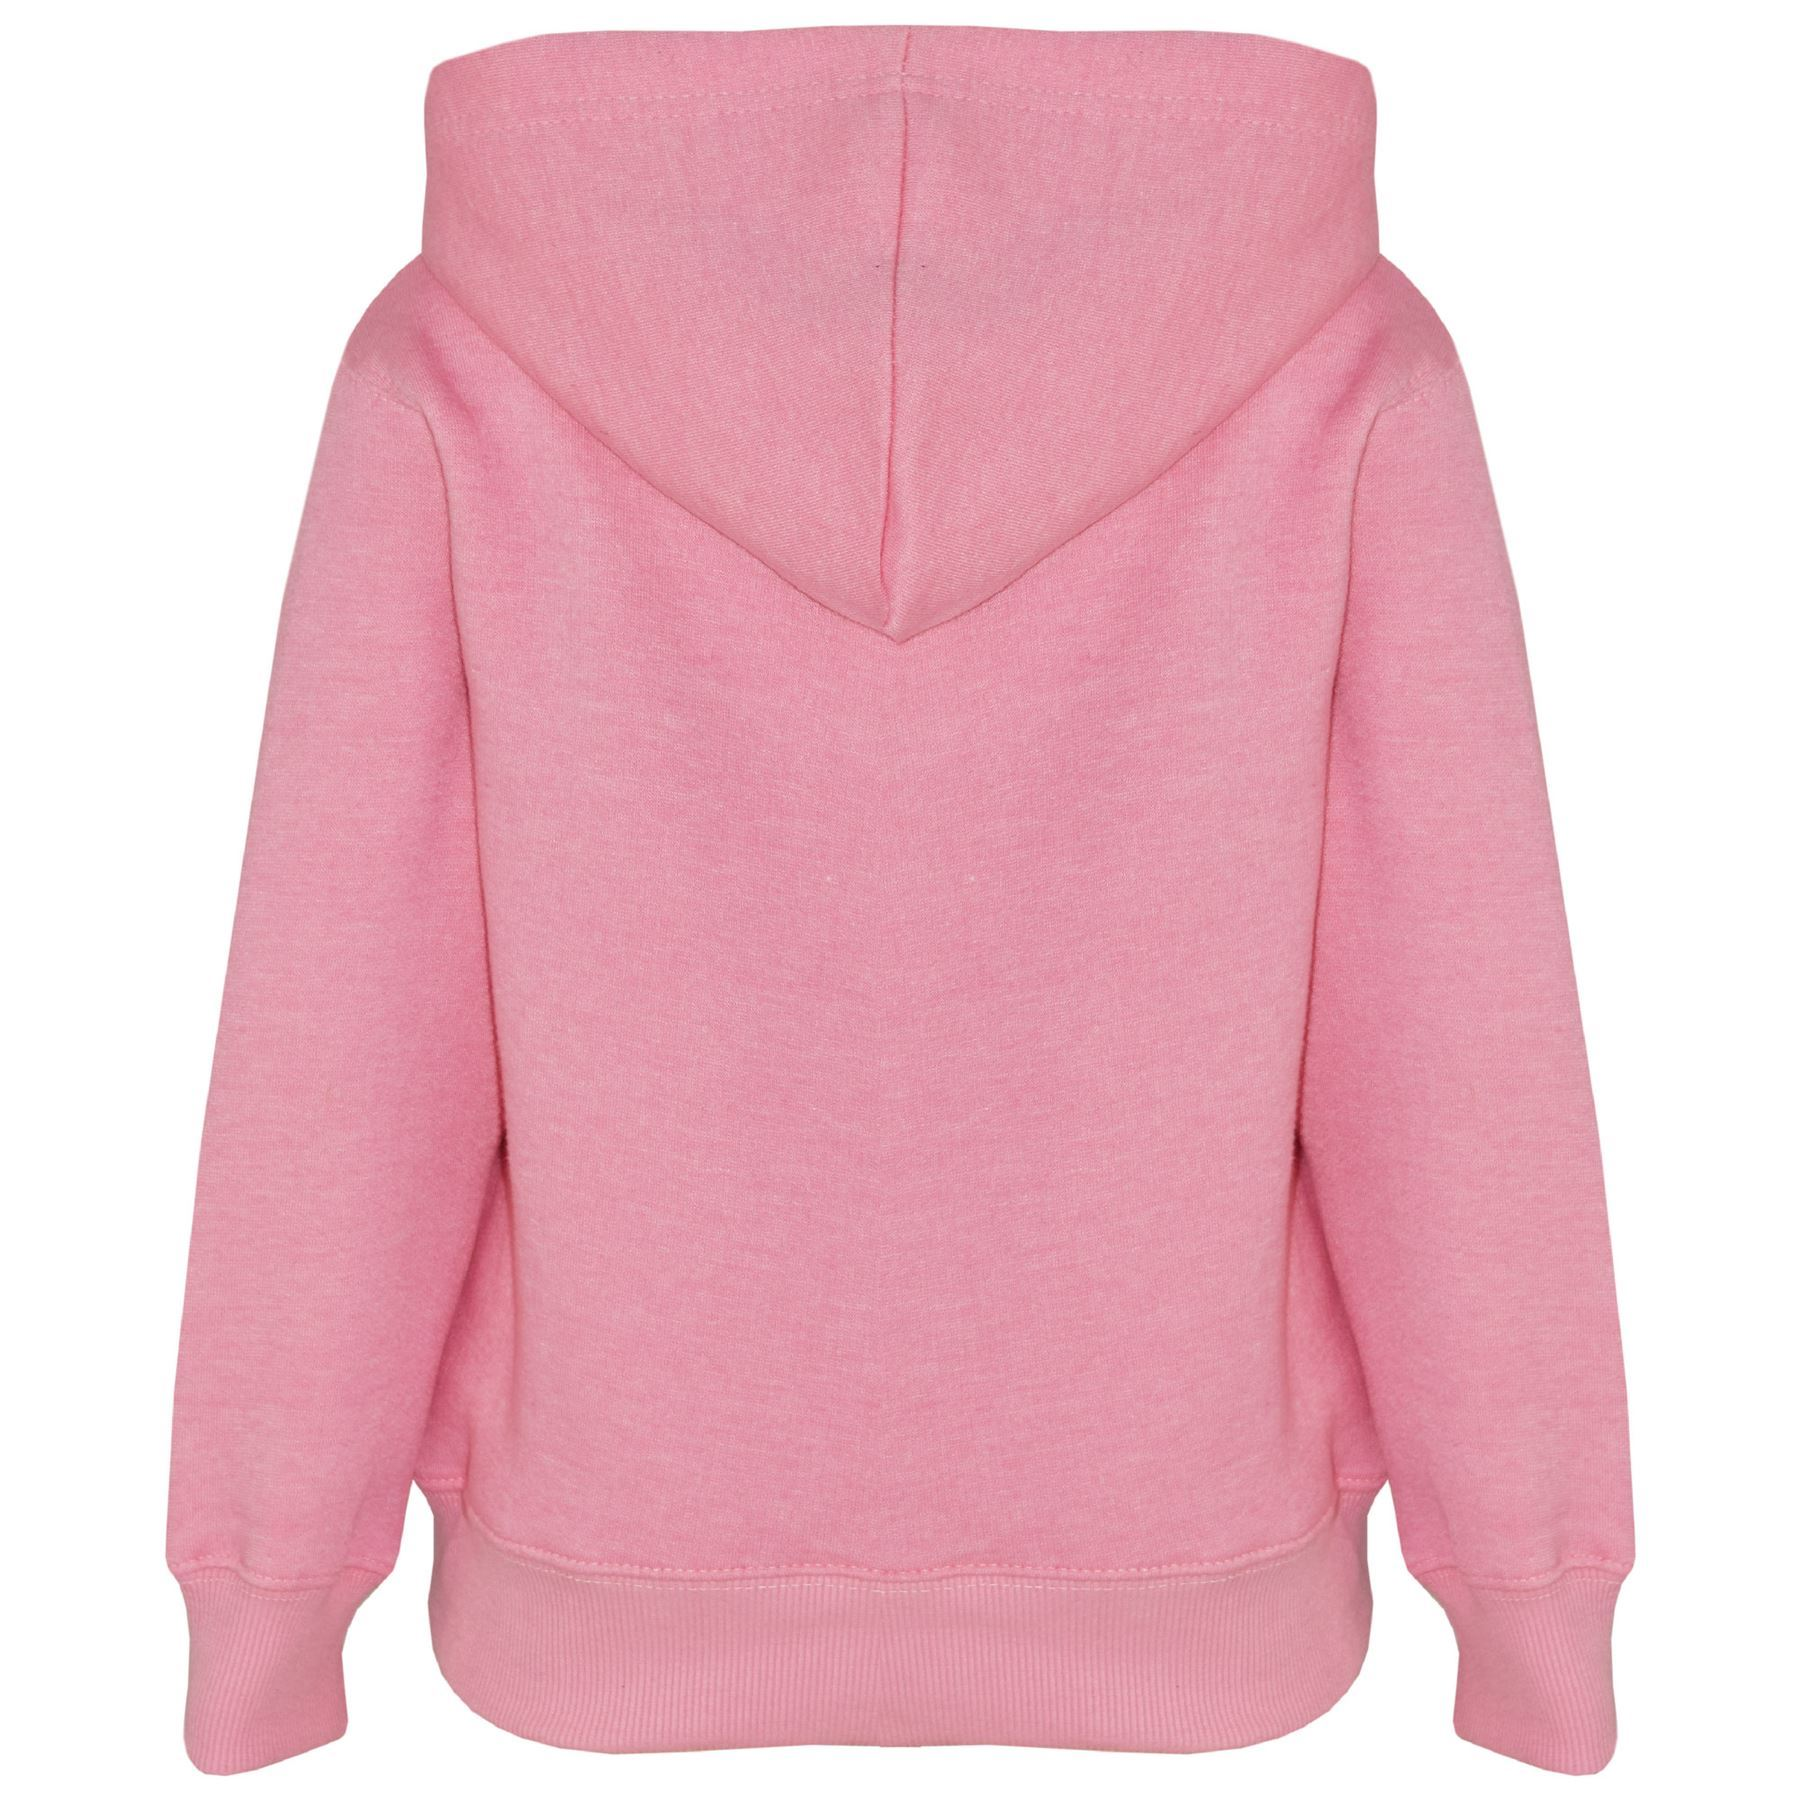 Kids Girls Boys Sweat Shirt Tops Plain Hooded Jumpers Hoodies New Age 2-13 Years